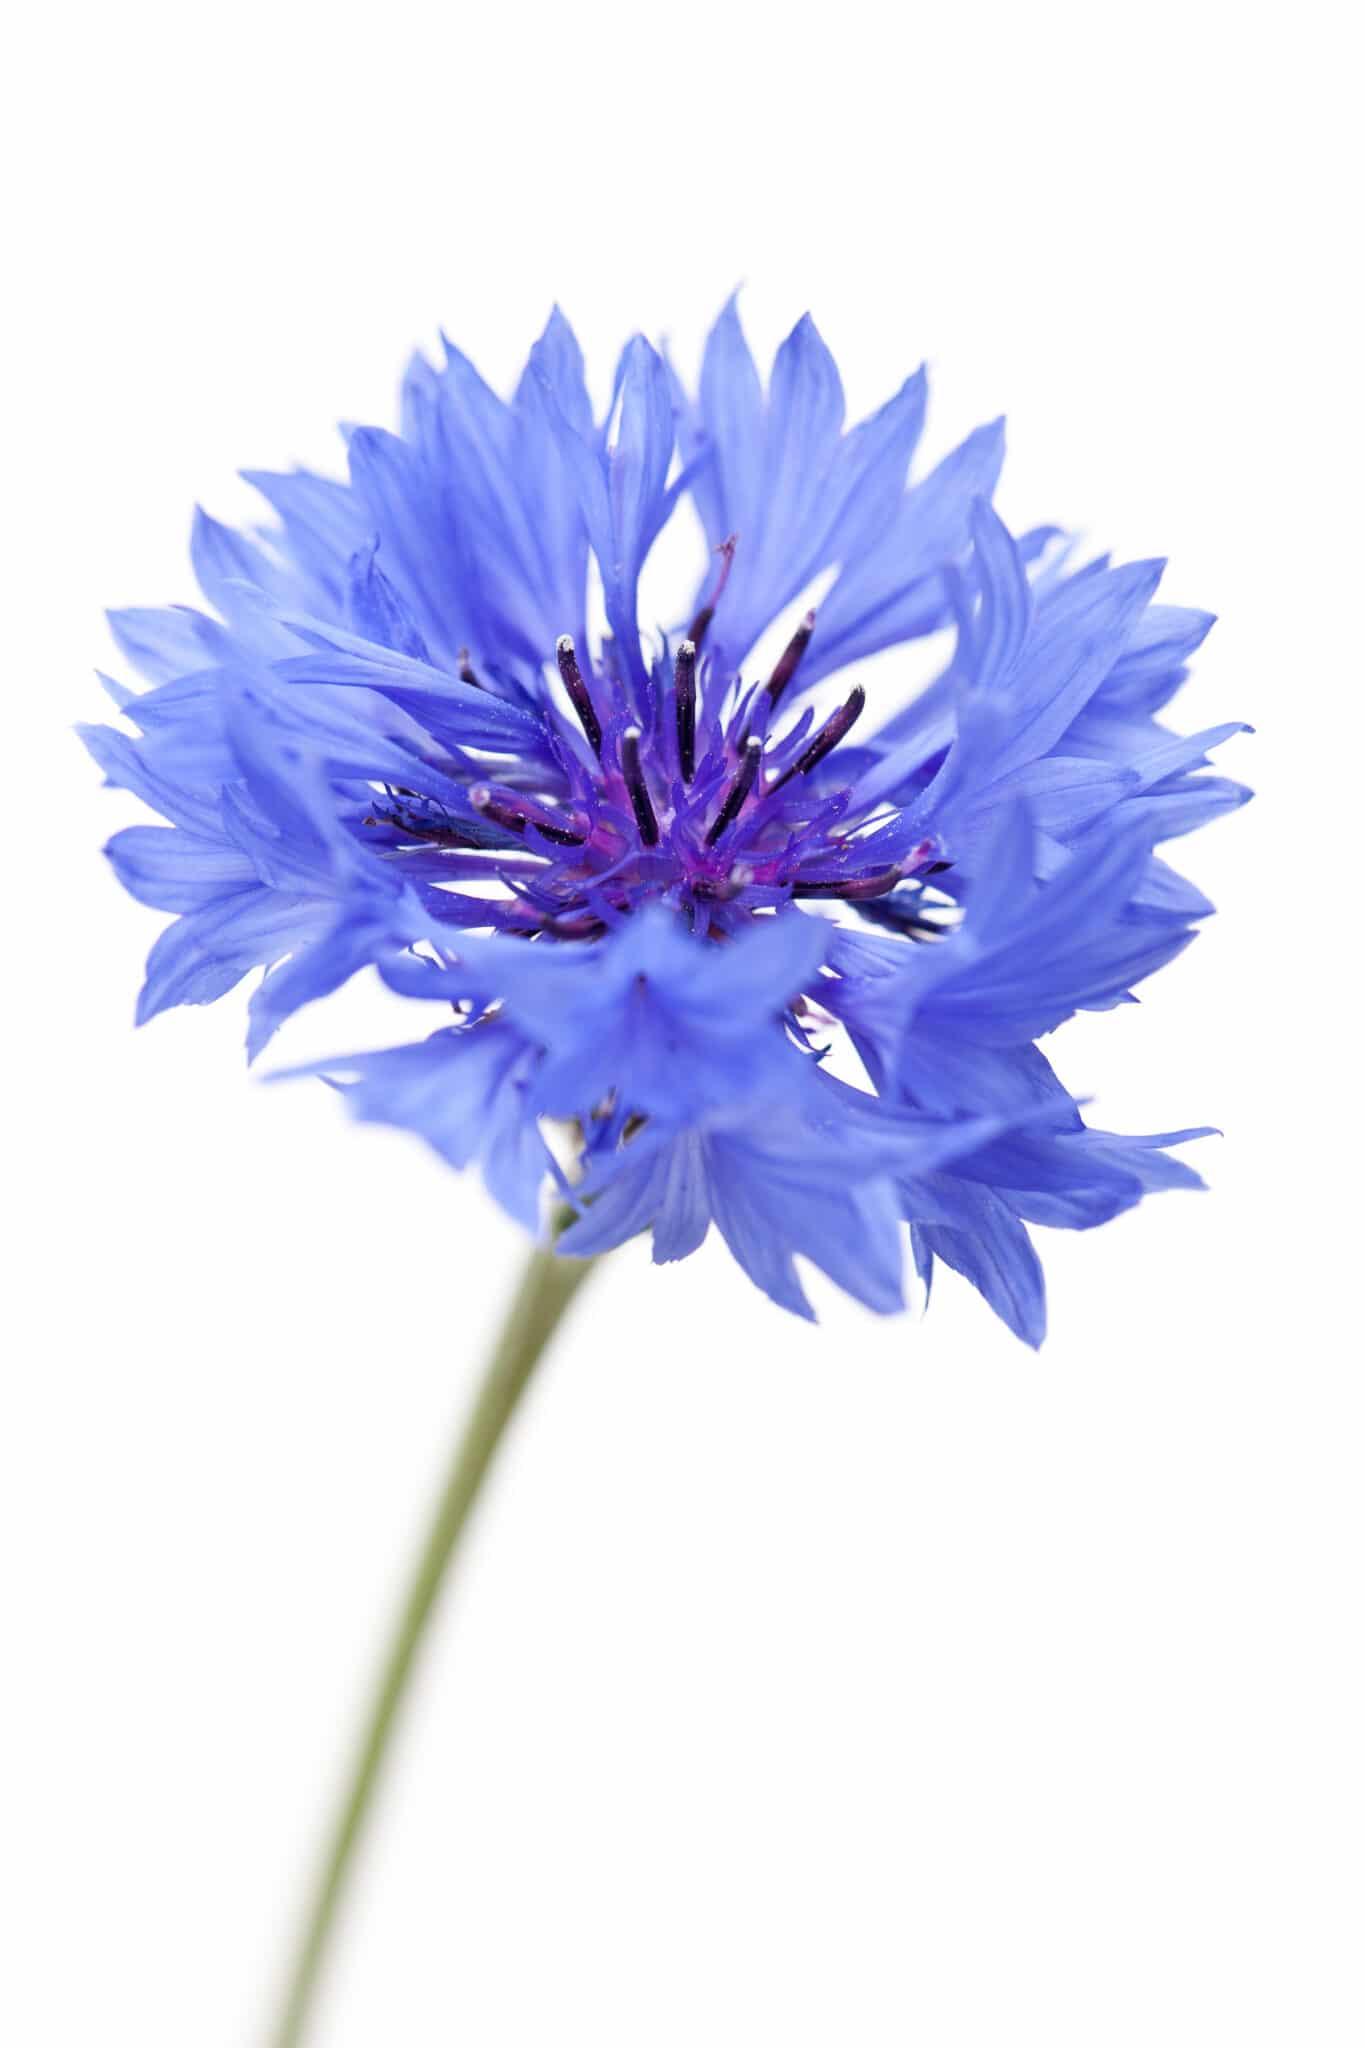 A bright blue bachelor's button flower.